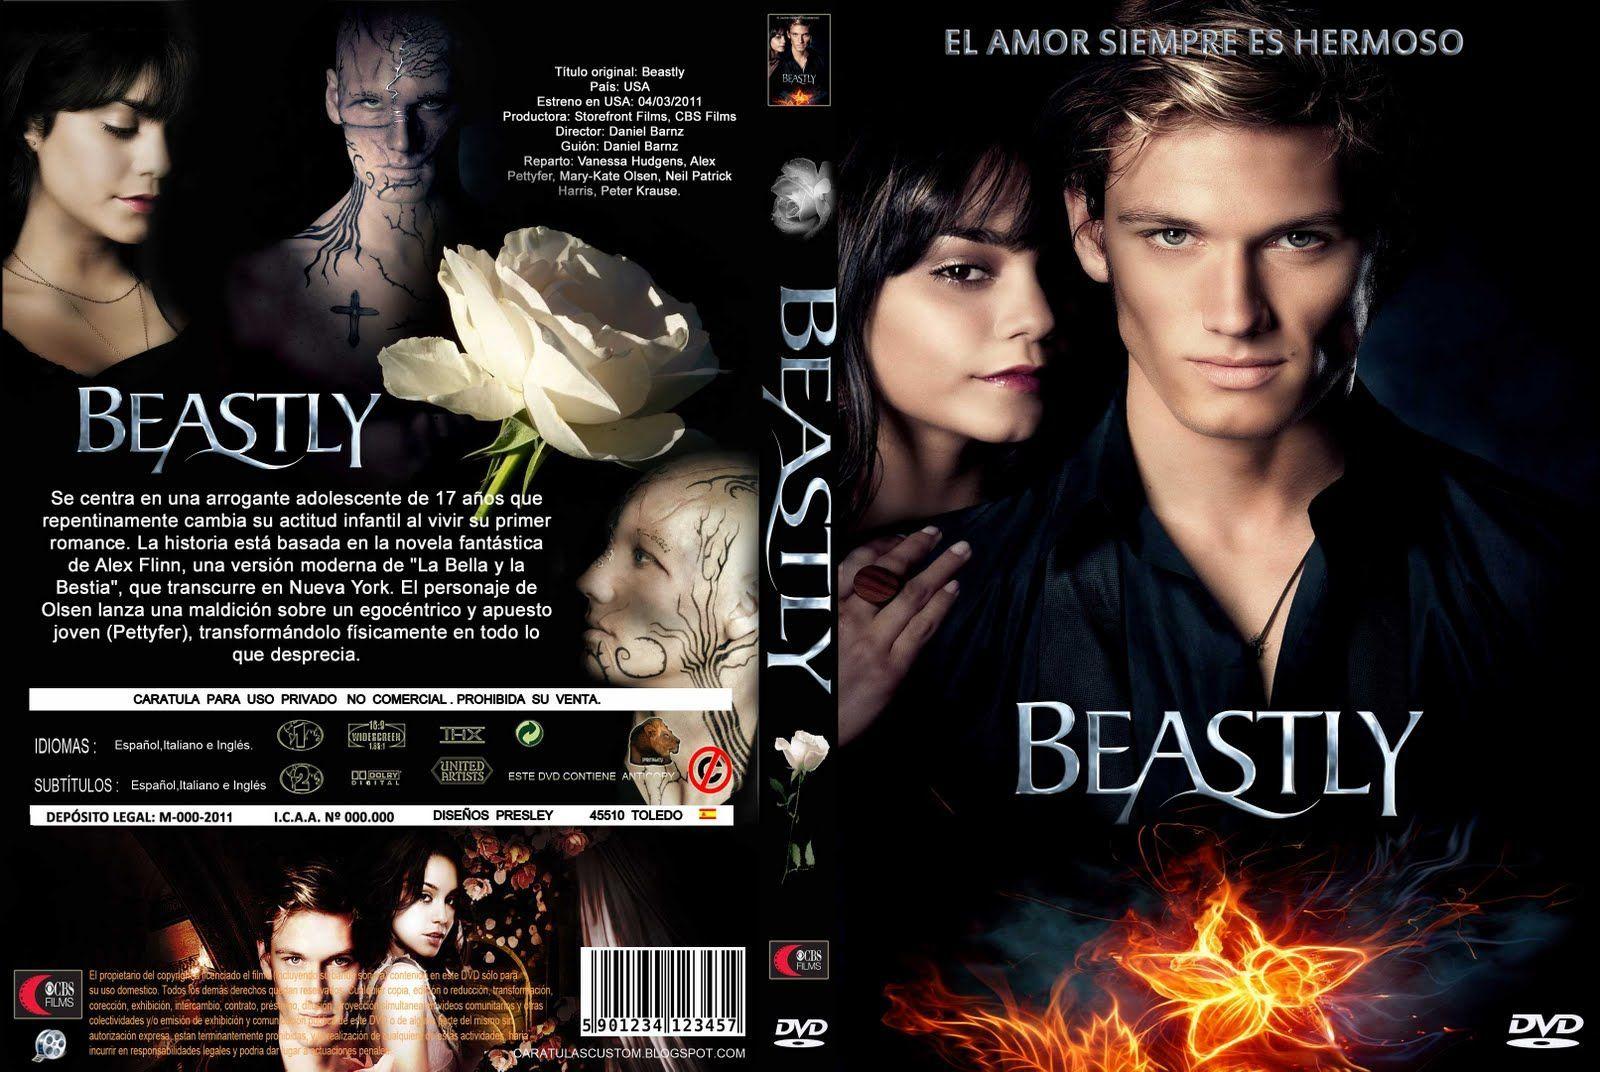 amazon pelicula dvd beastly español